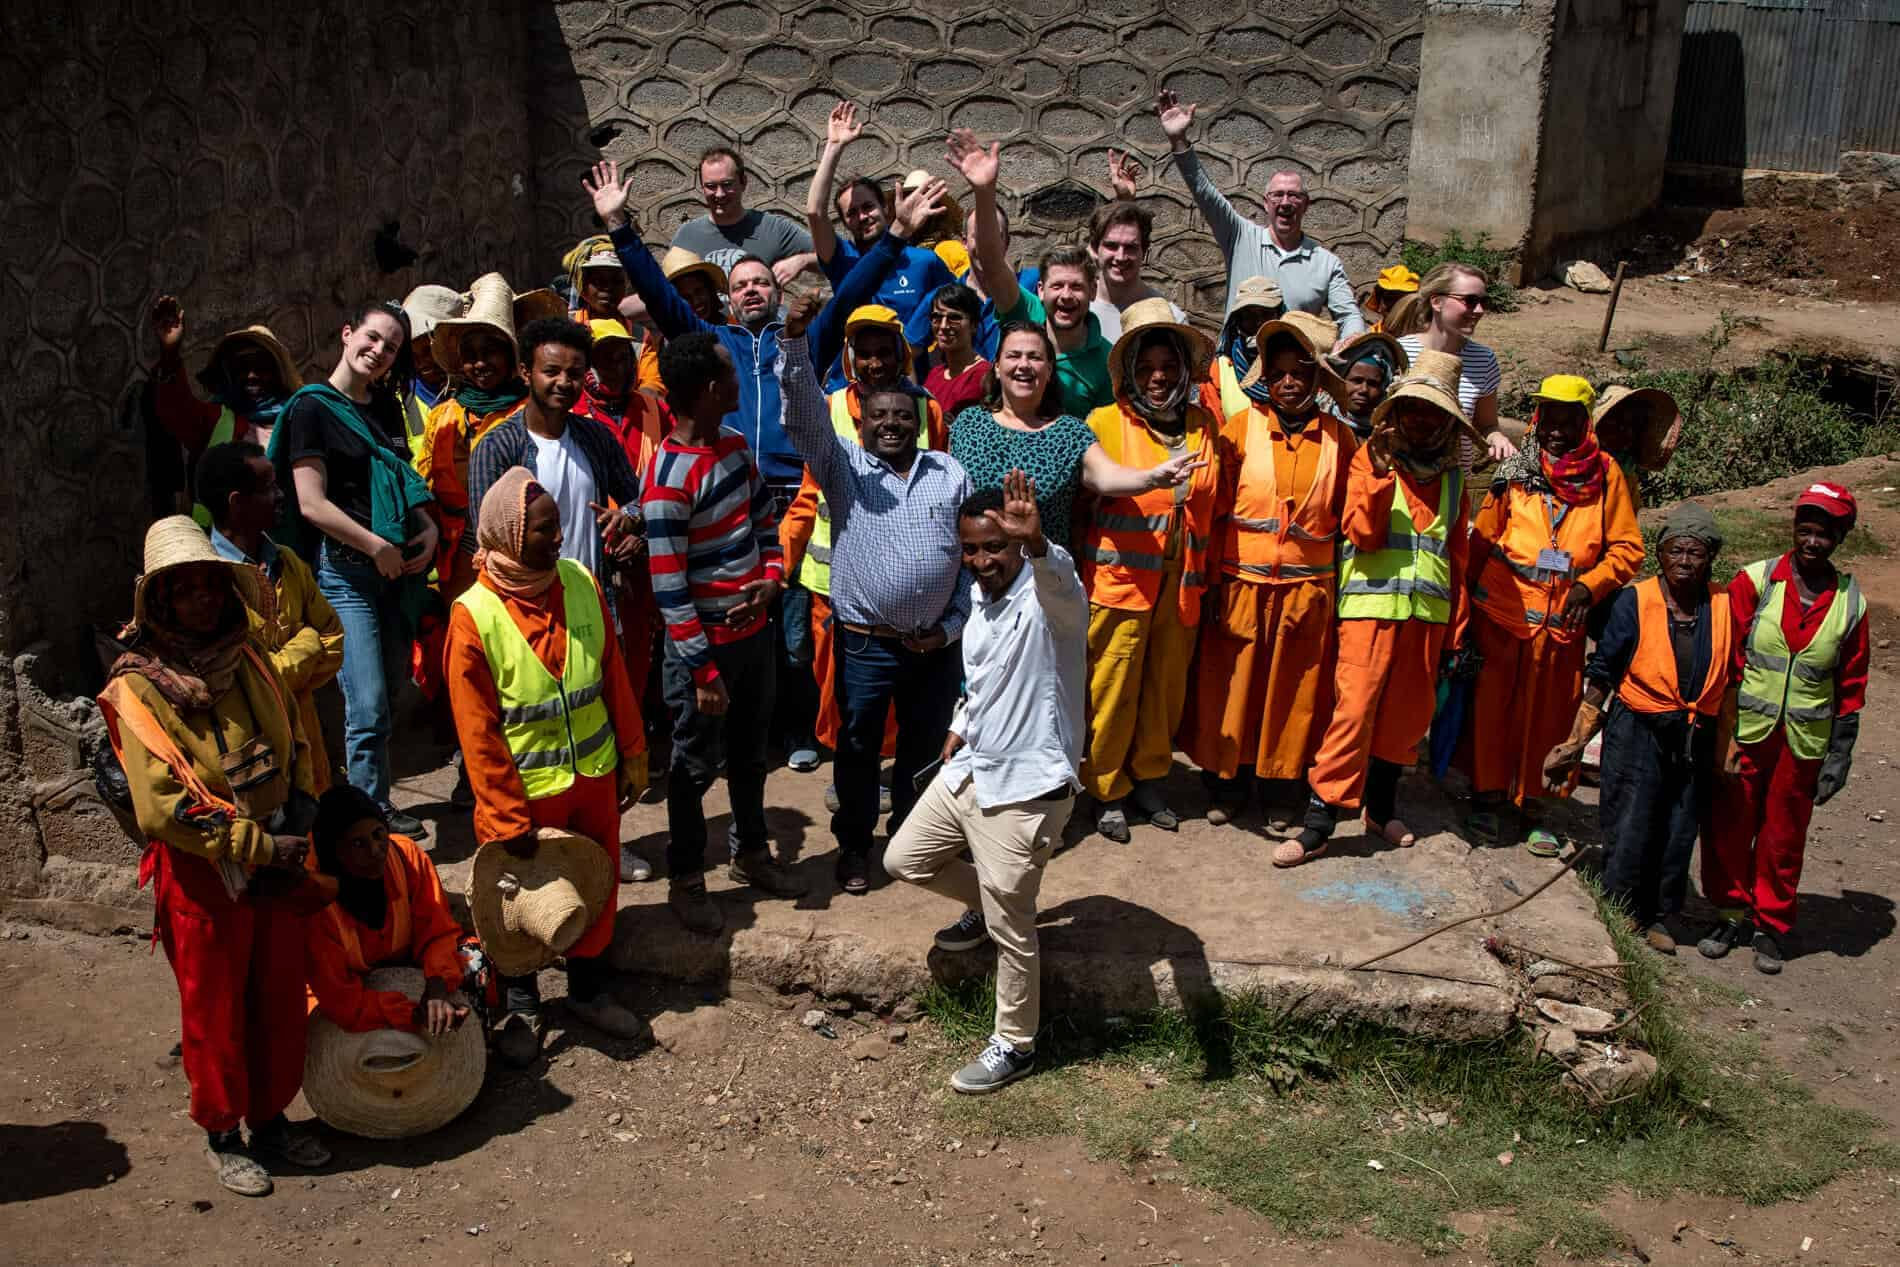 MADE BLUE - Dag 1 - Impactreis Ethiopië - Foto: Anne Harteman